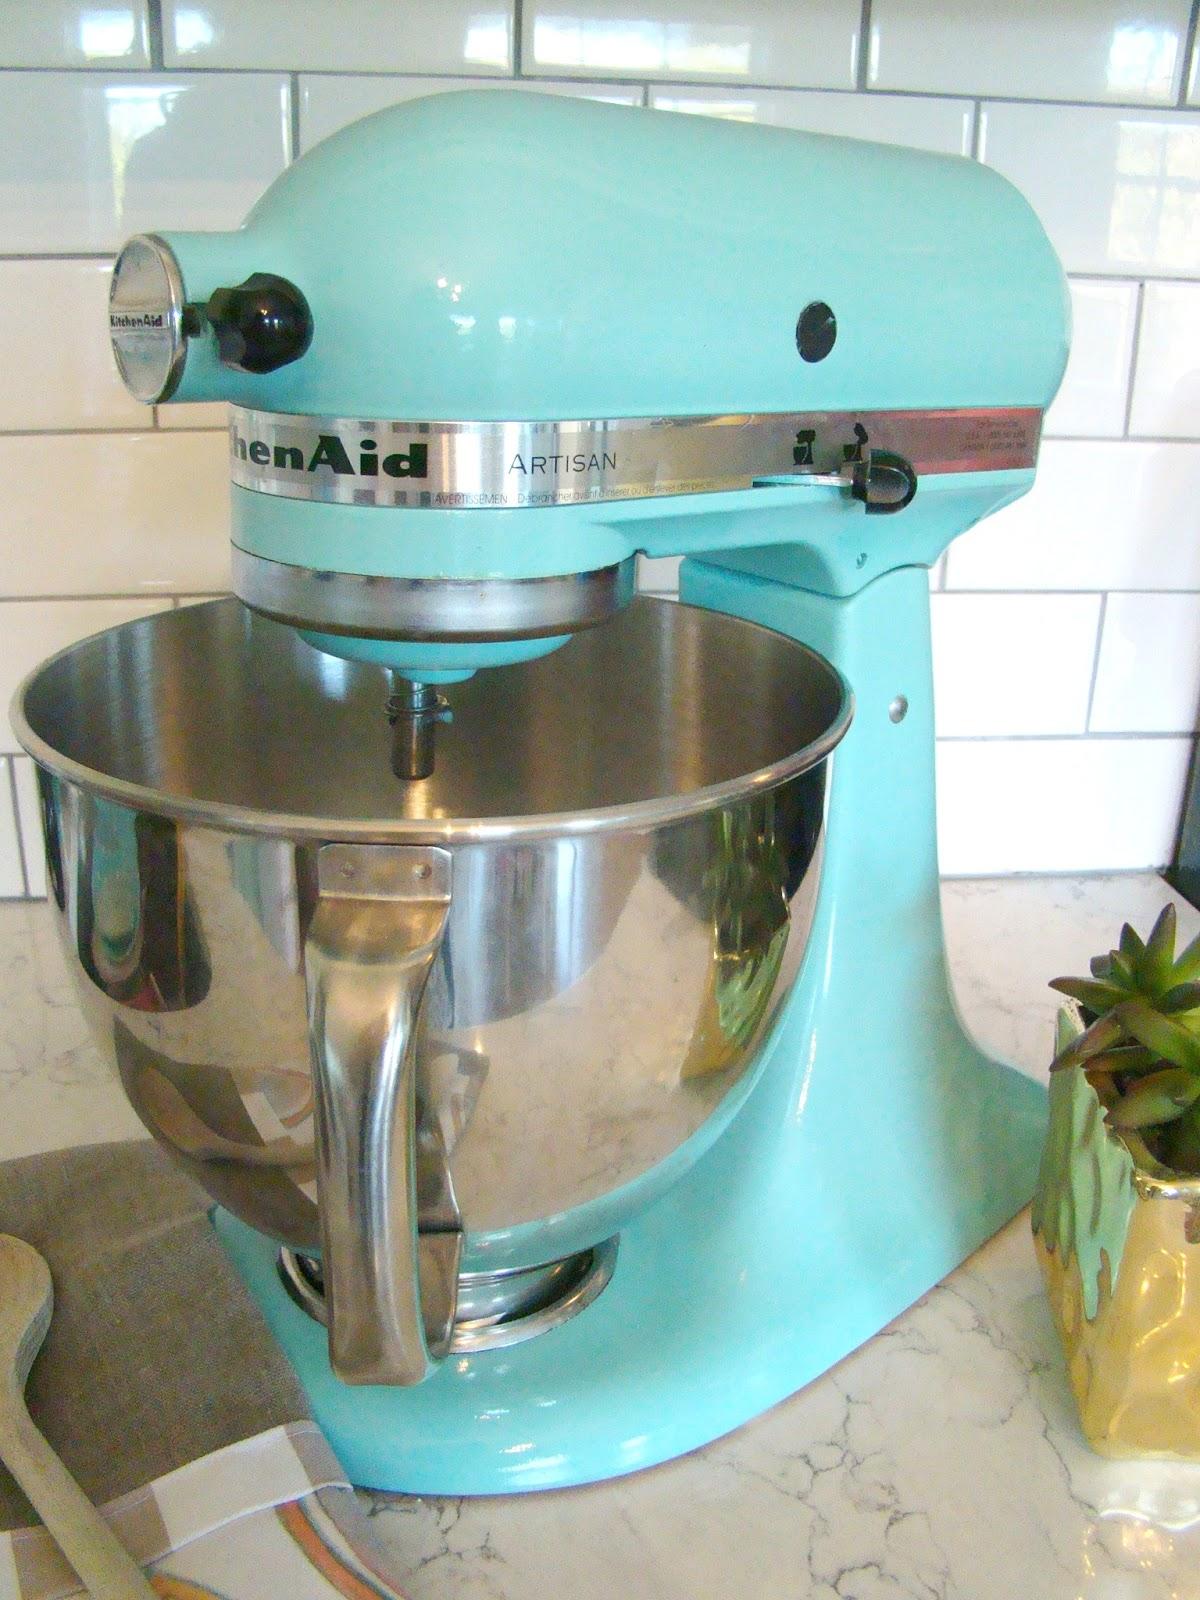 Southern Bluebird Day: KitchenAid Mixer Refresh